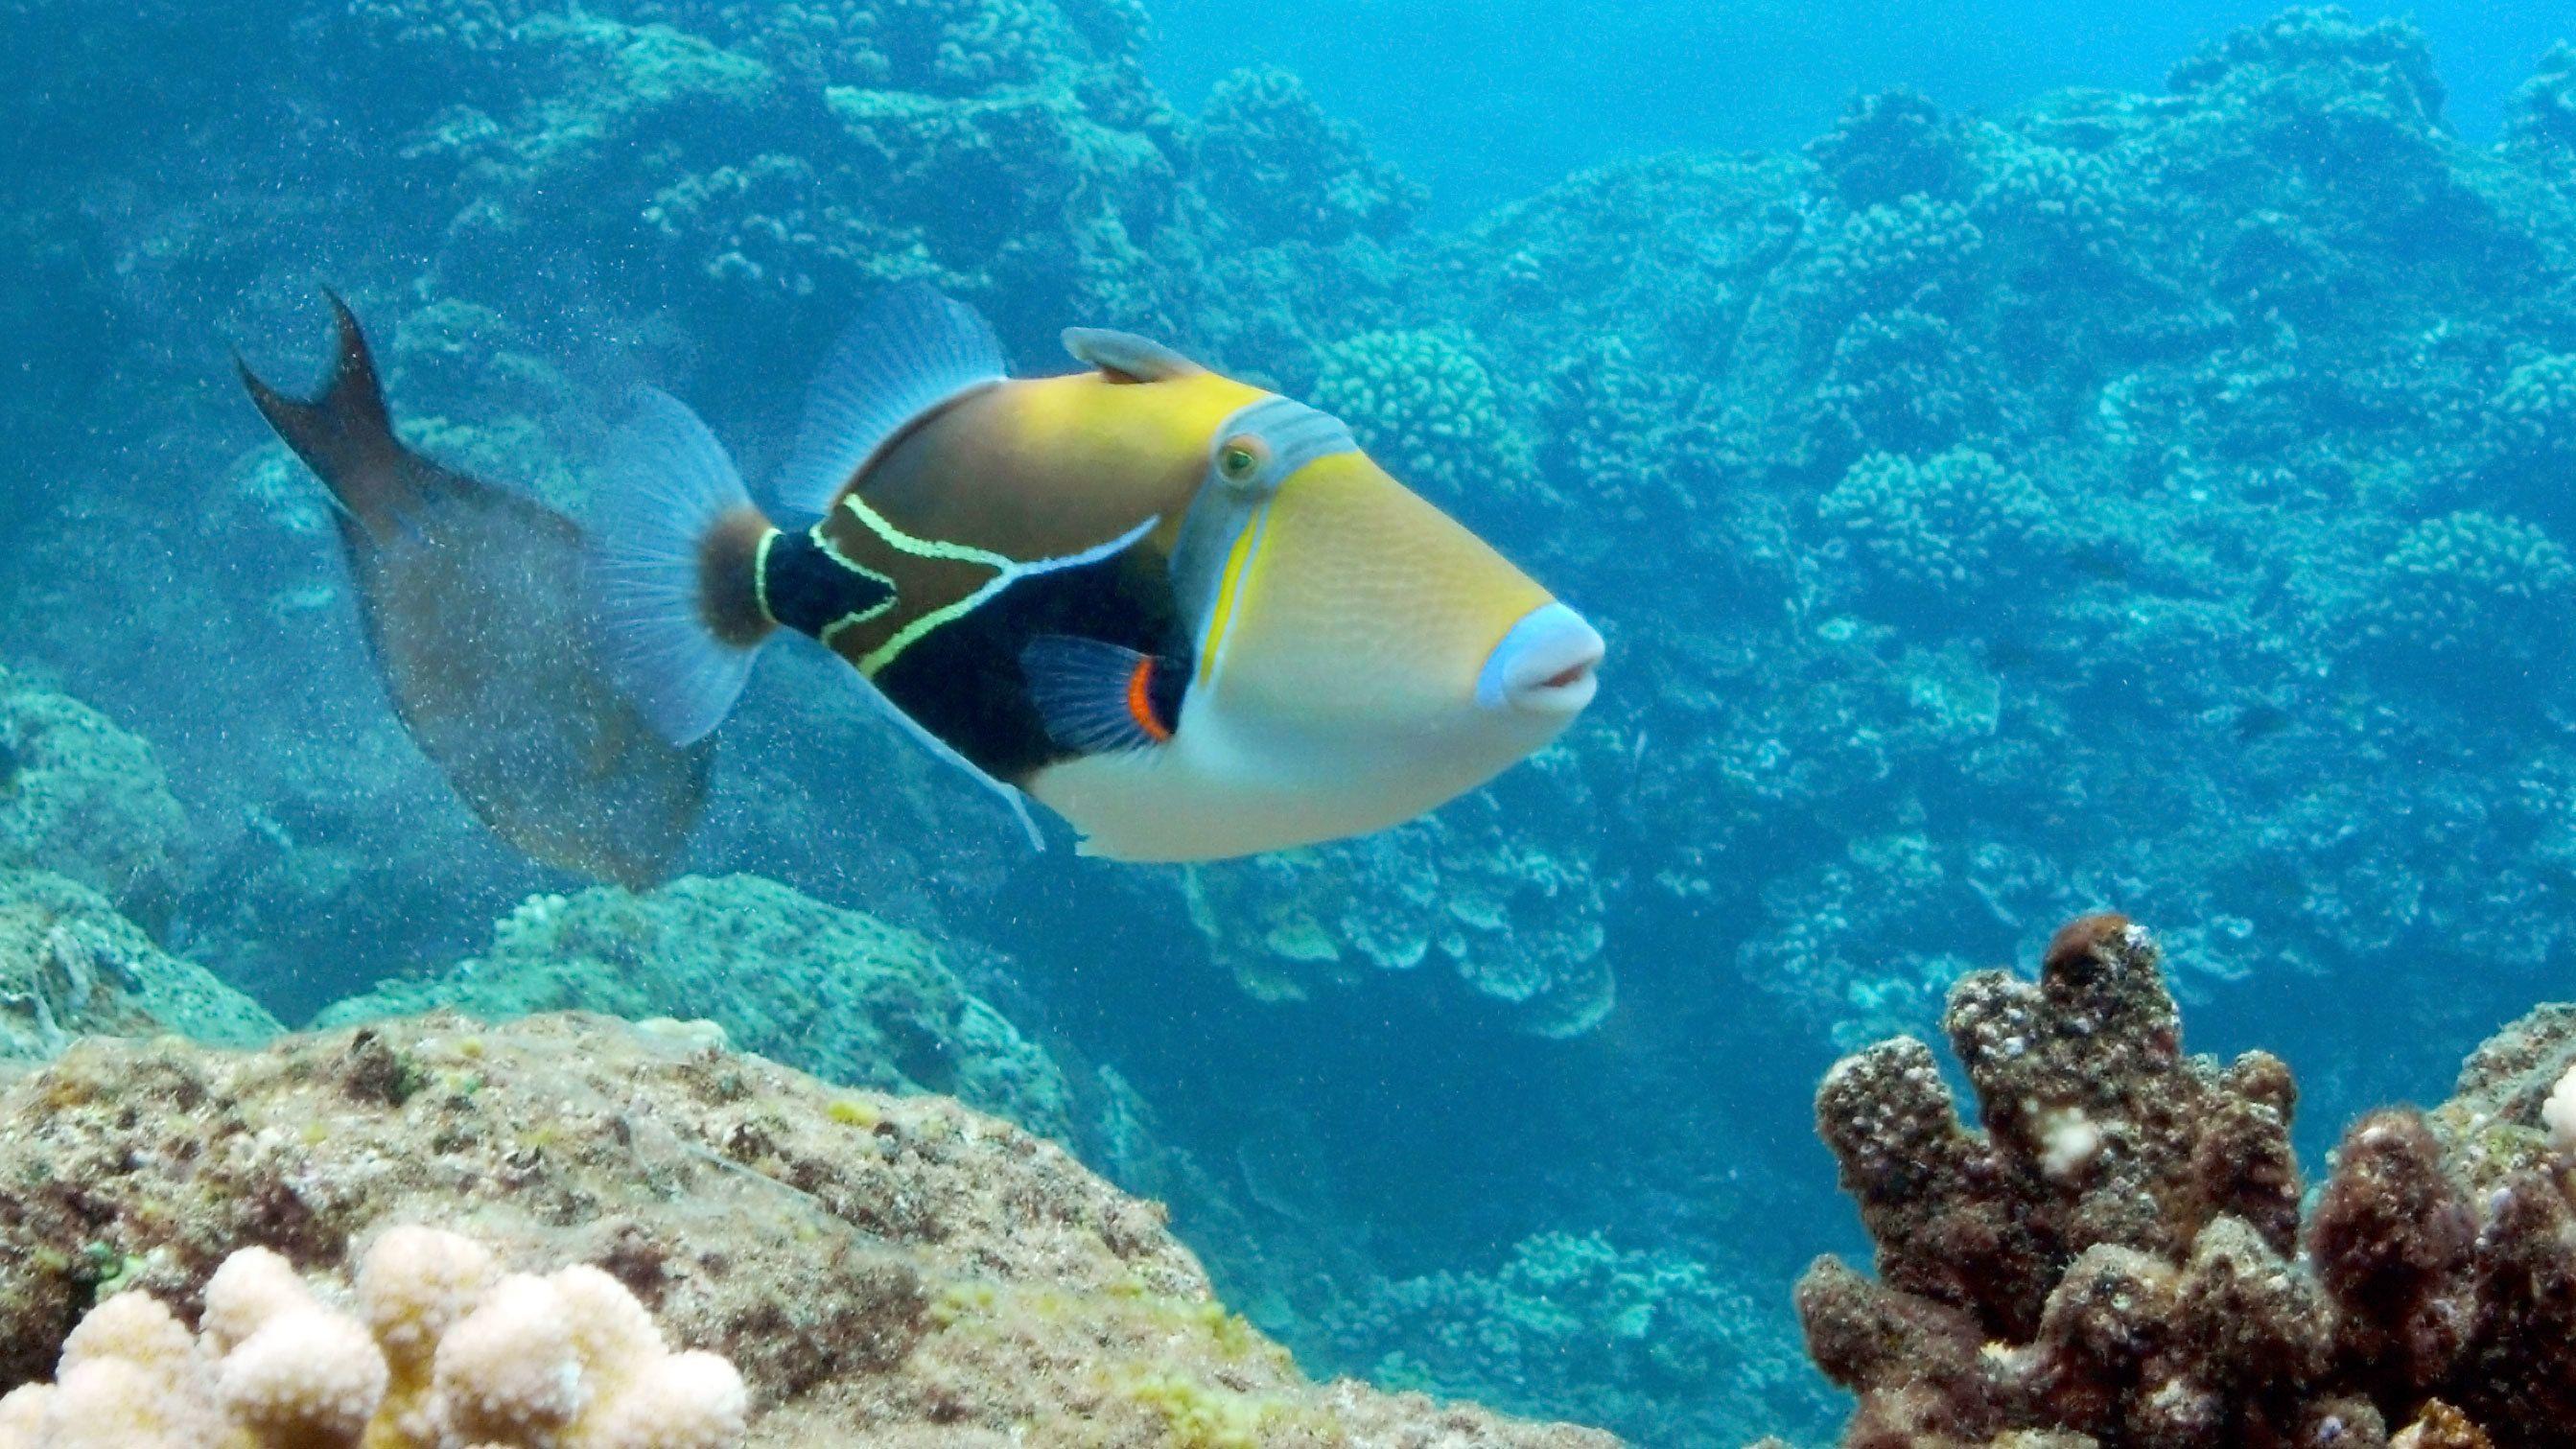 Large colorful fish